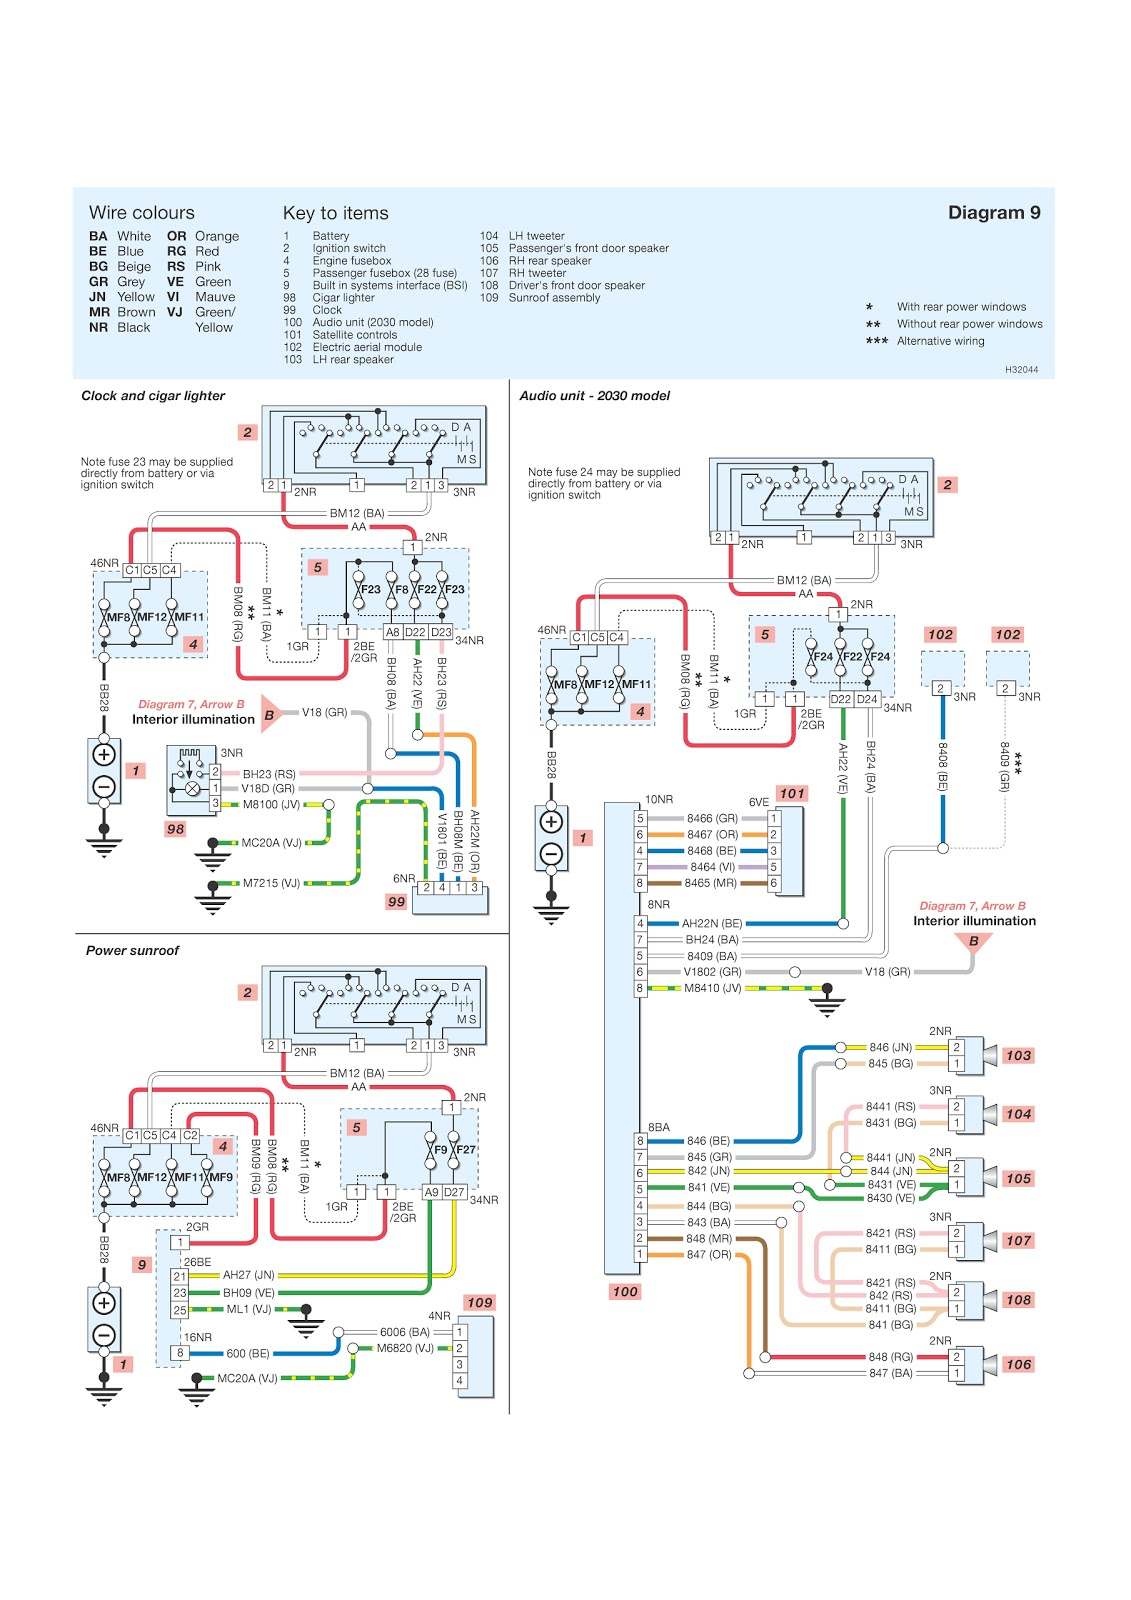 Peugeot 206 System Wiring Diagrams Clock, Cigar Lighter